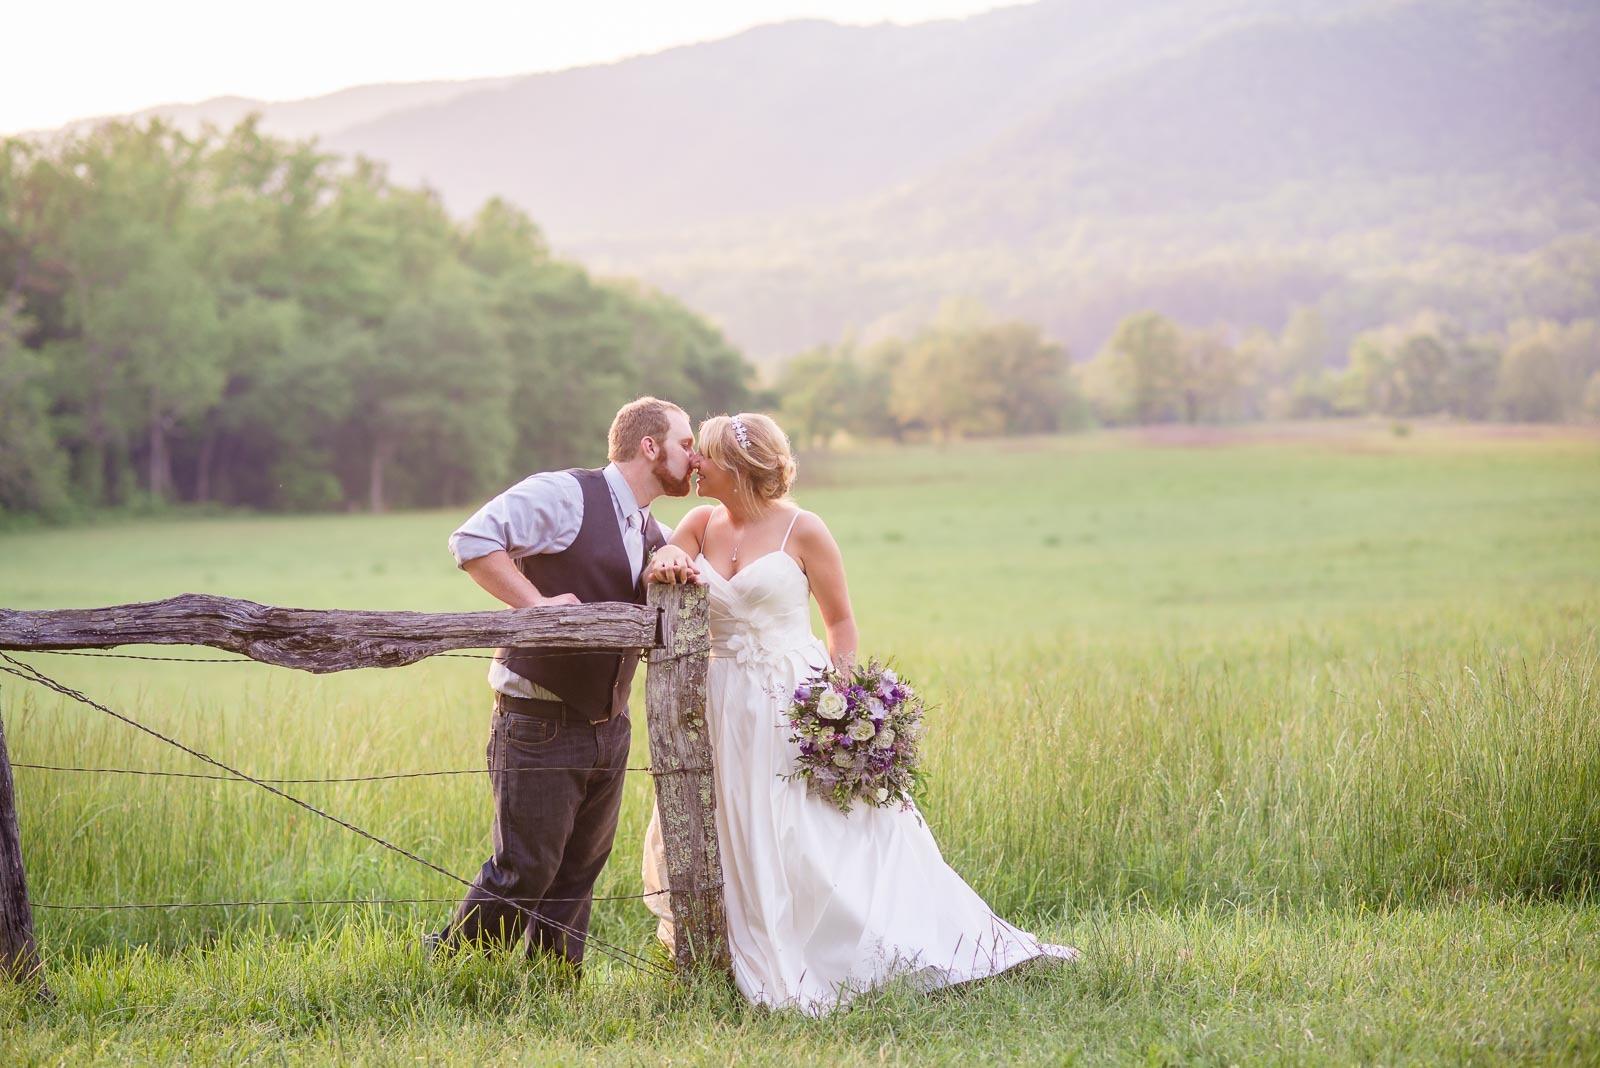 Cades Cove TN Wedding | Josh and Jeylan